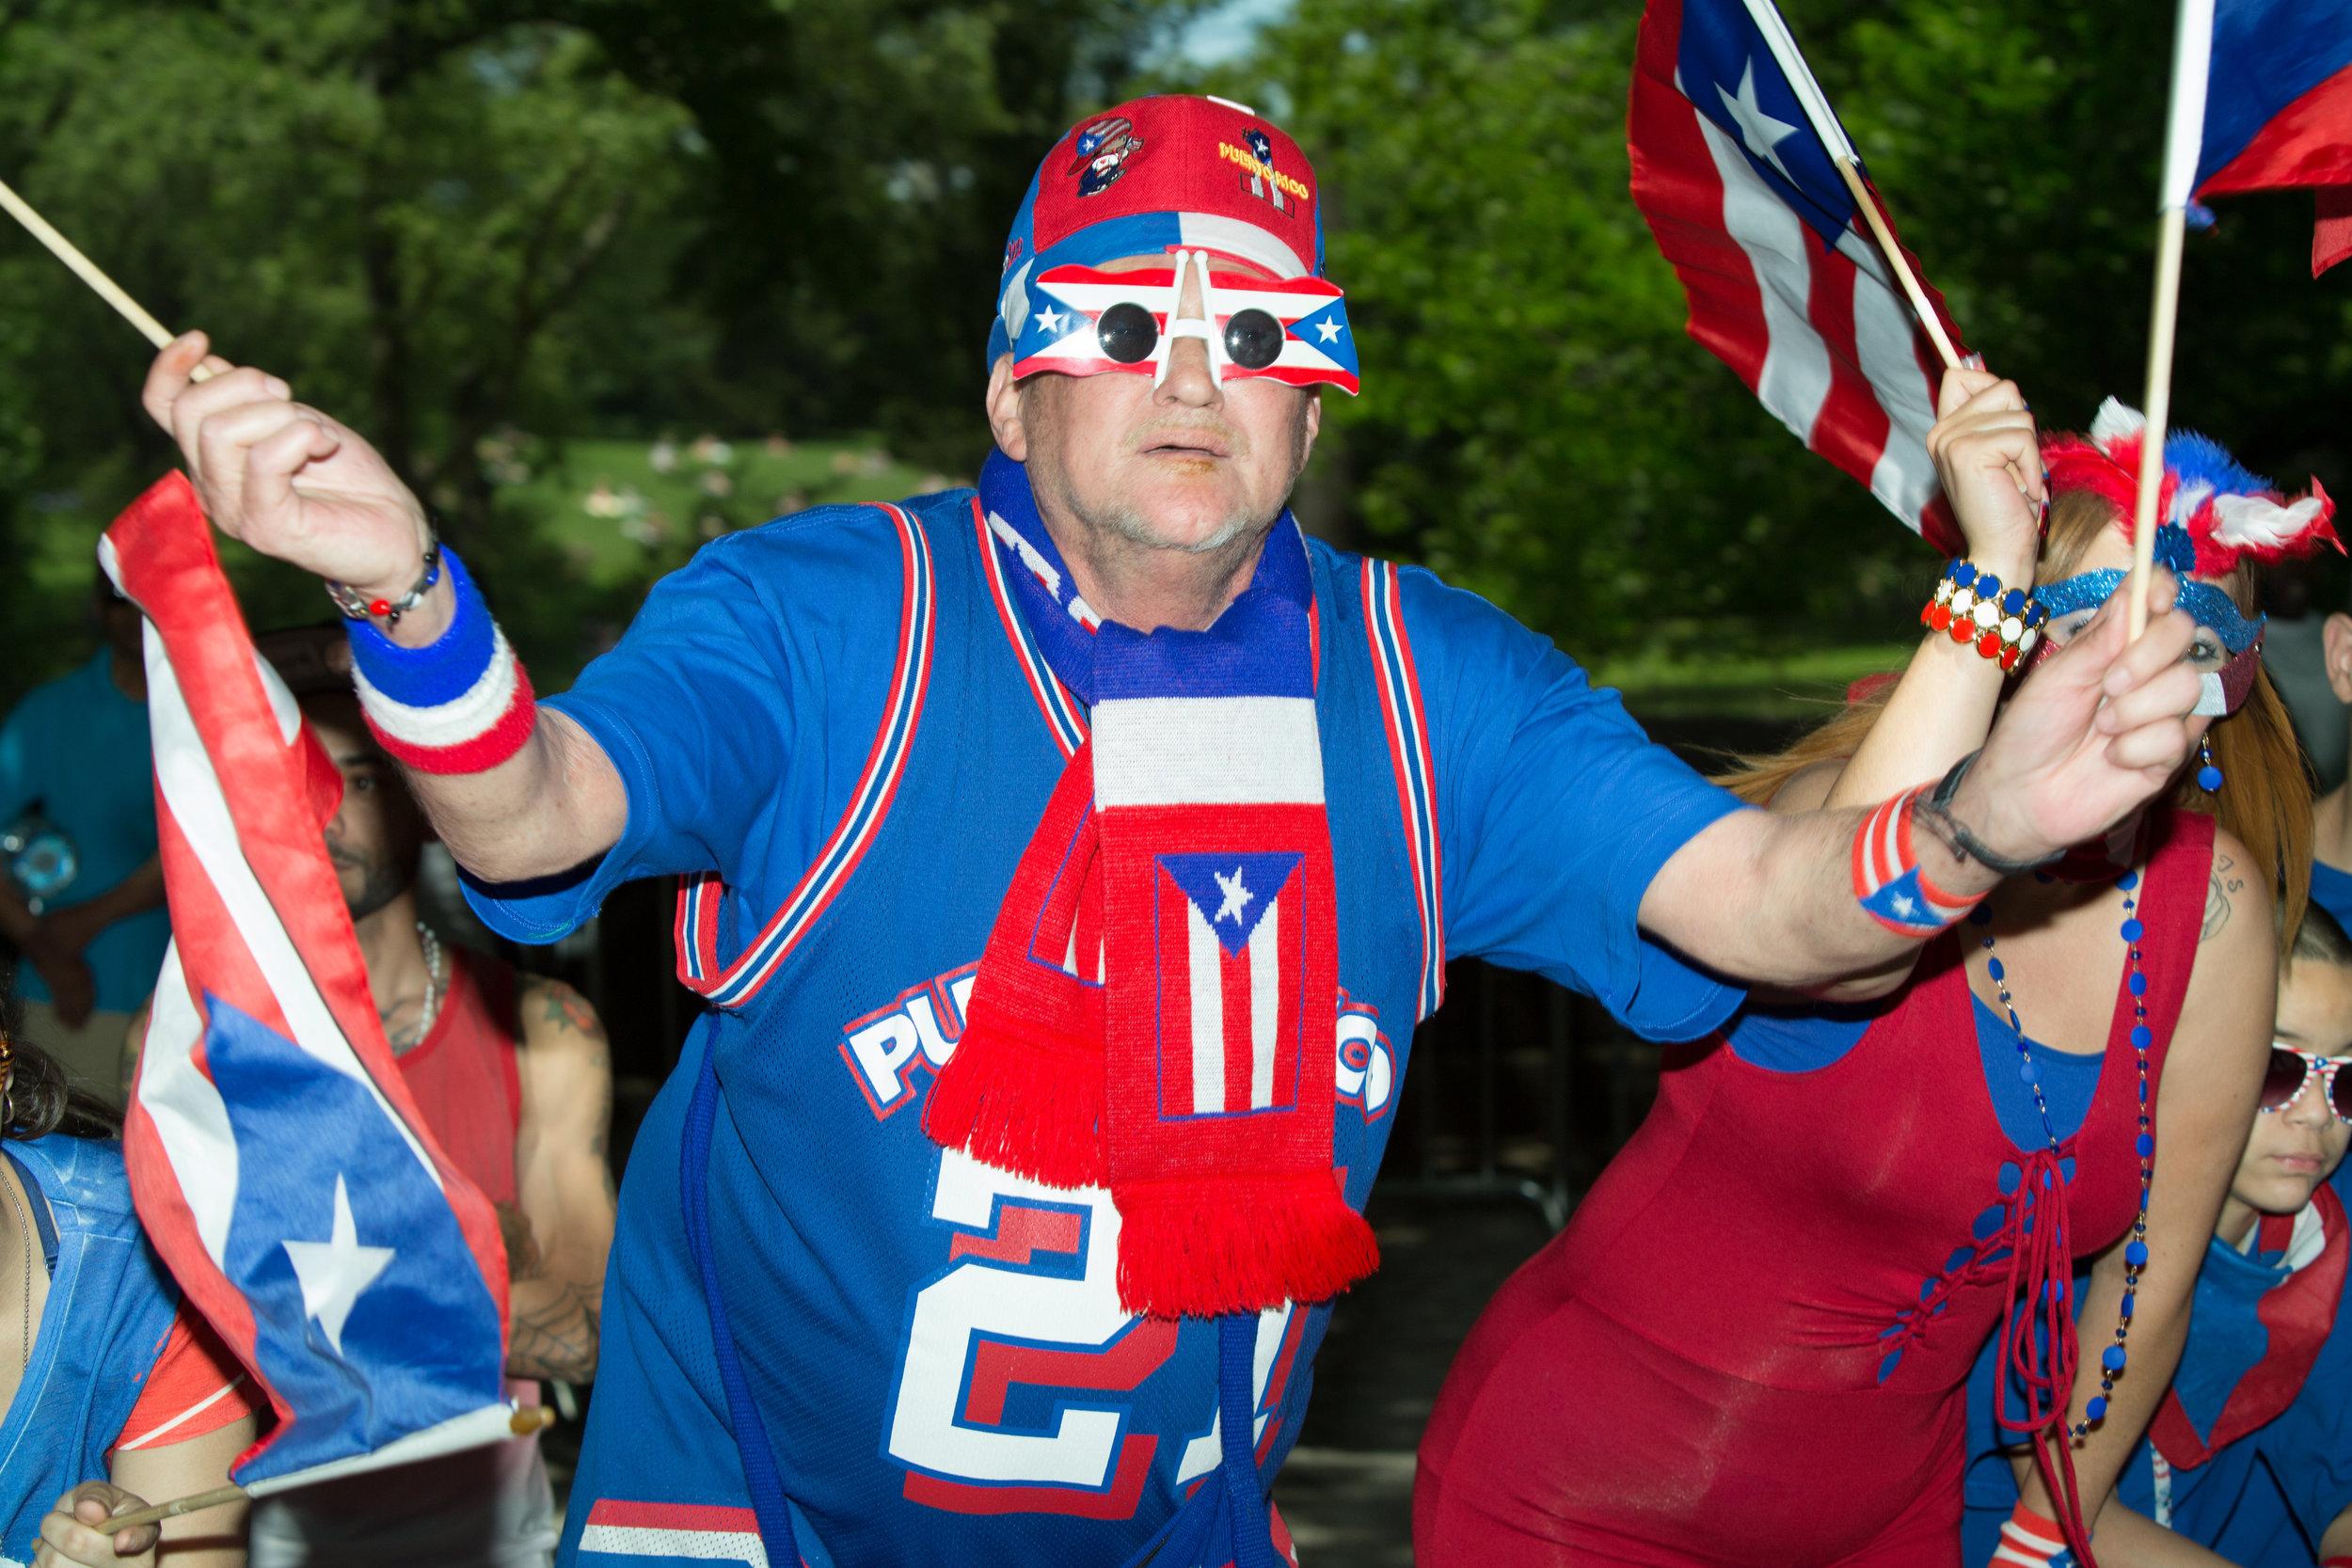 puertoricandayparade-7.jpg